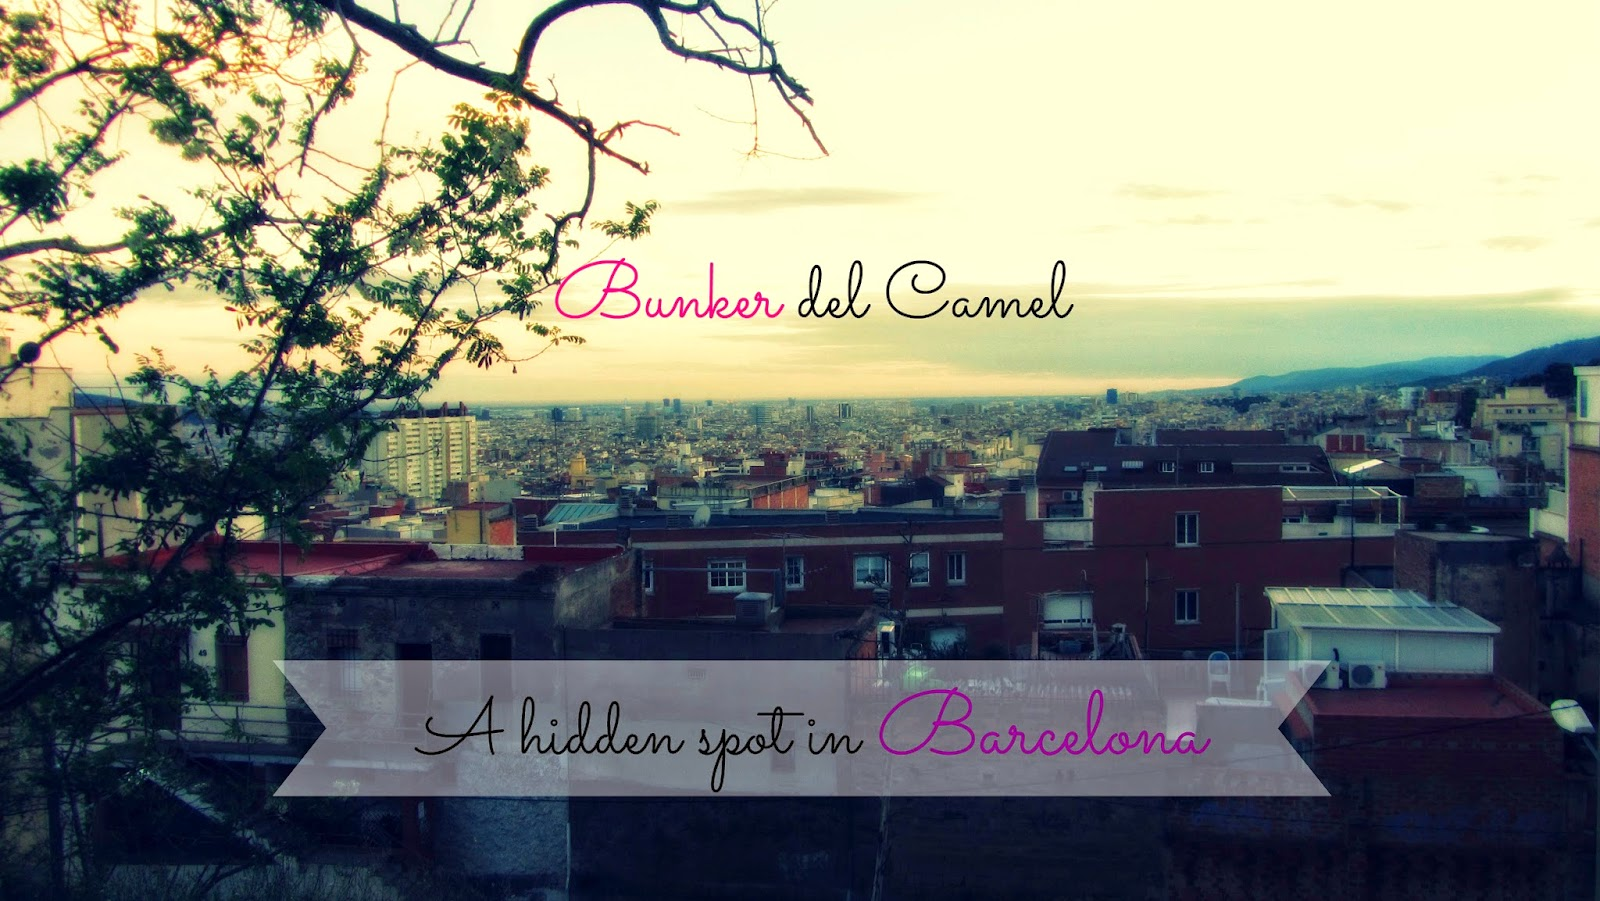 http://sussysmediterraneantreasures.blogspot.de/2014/04/barcelona-der-bunker-einzigartiger.html